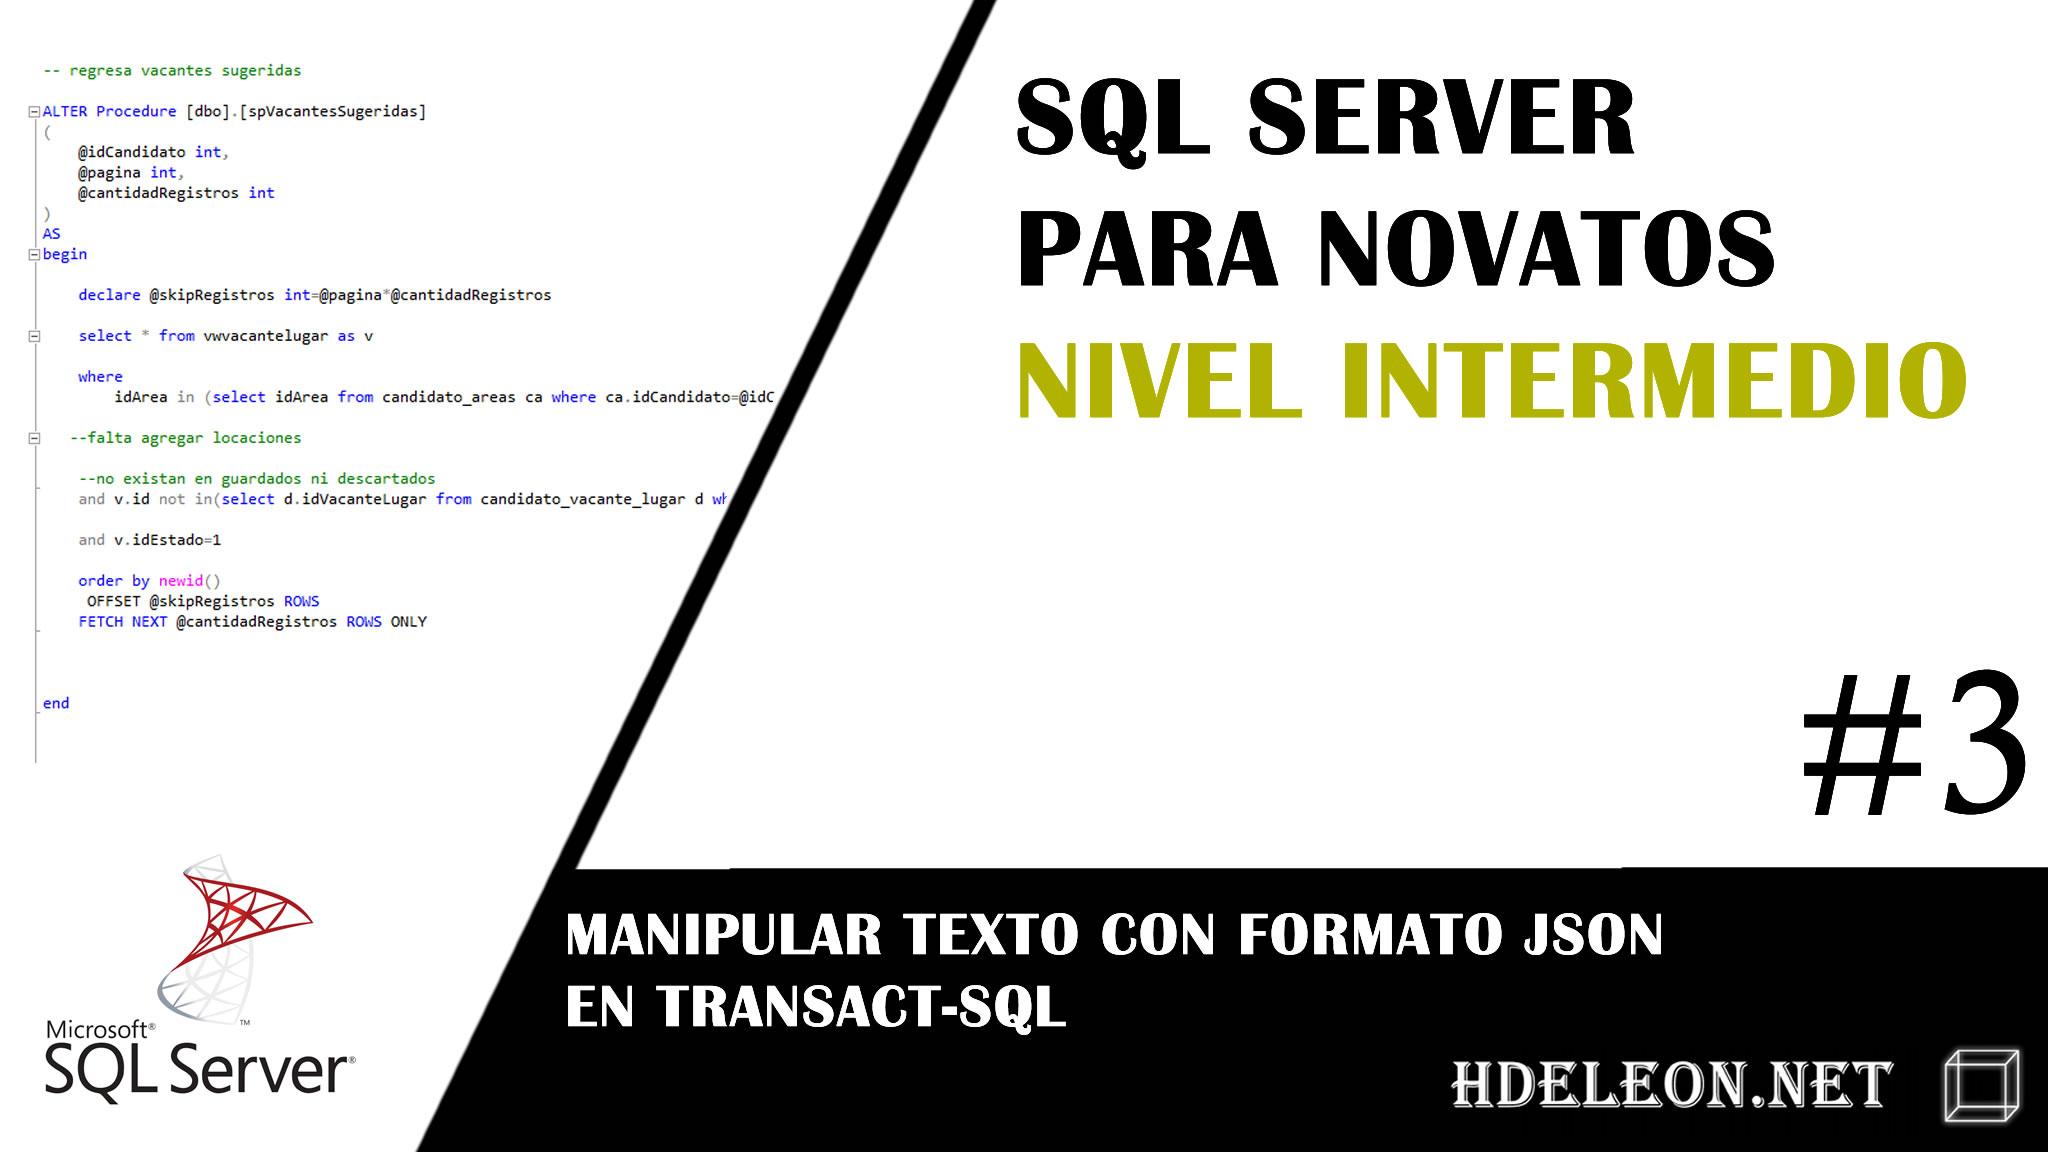 Sql Server nivel Intermedio, Manipular texto con formato JSON en transact-sql, #3